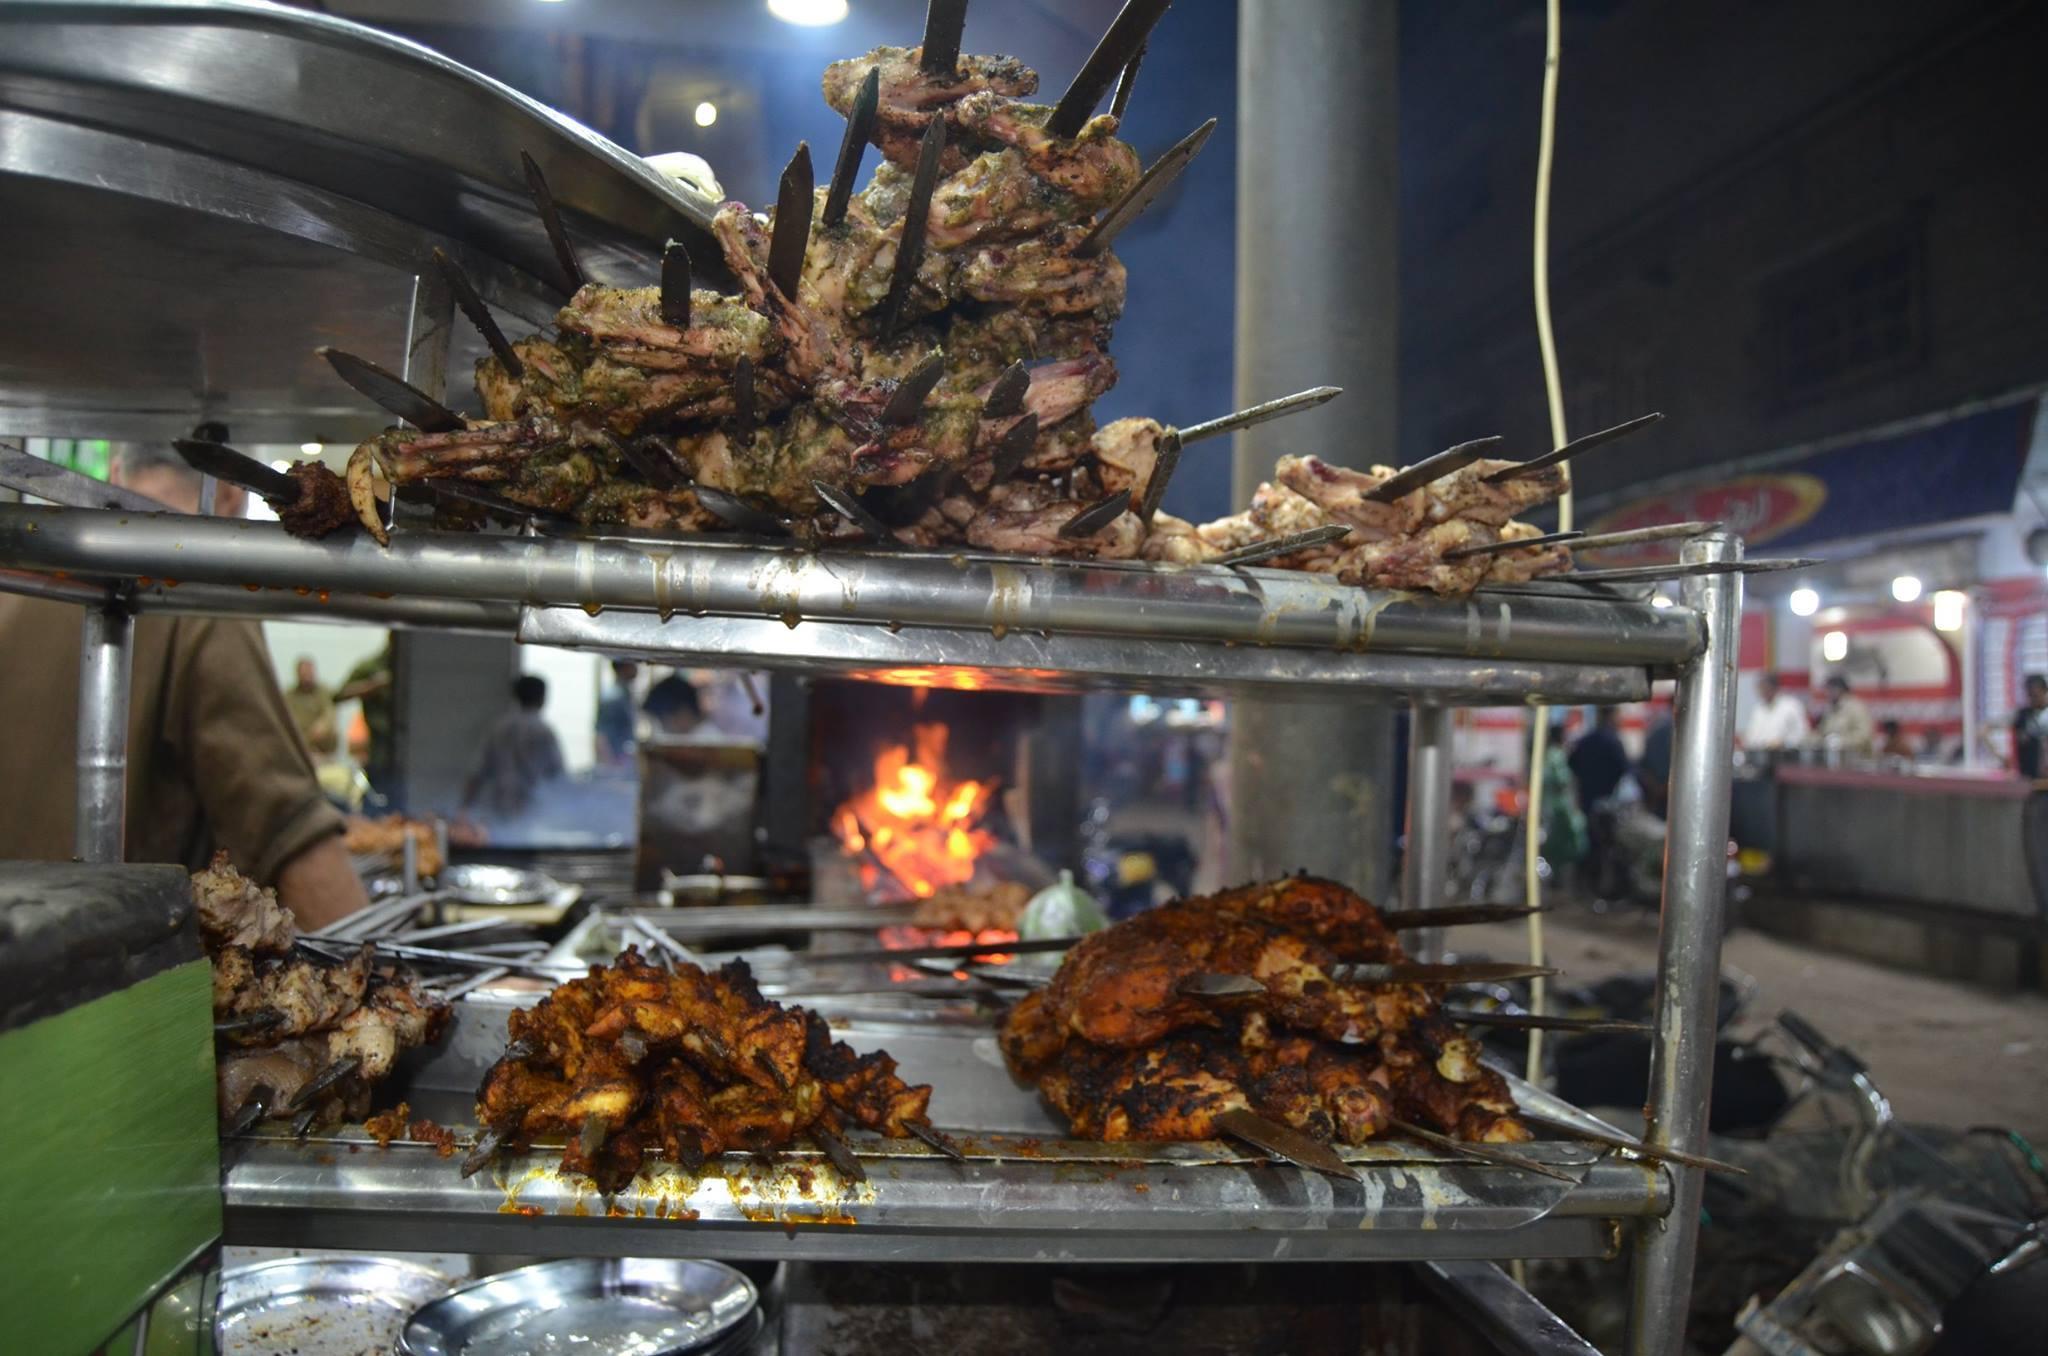 Delhi Food Street springs to life at night